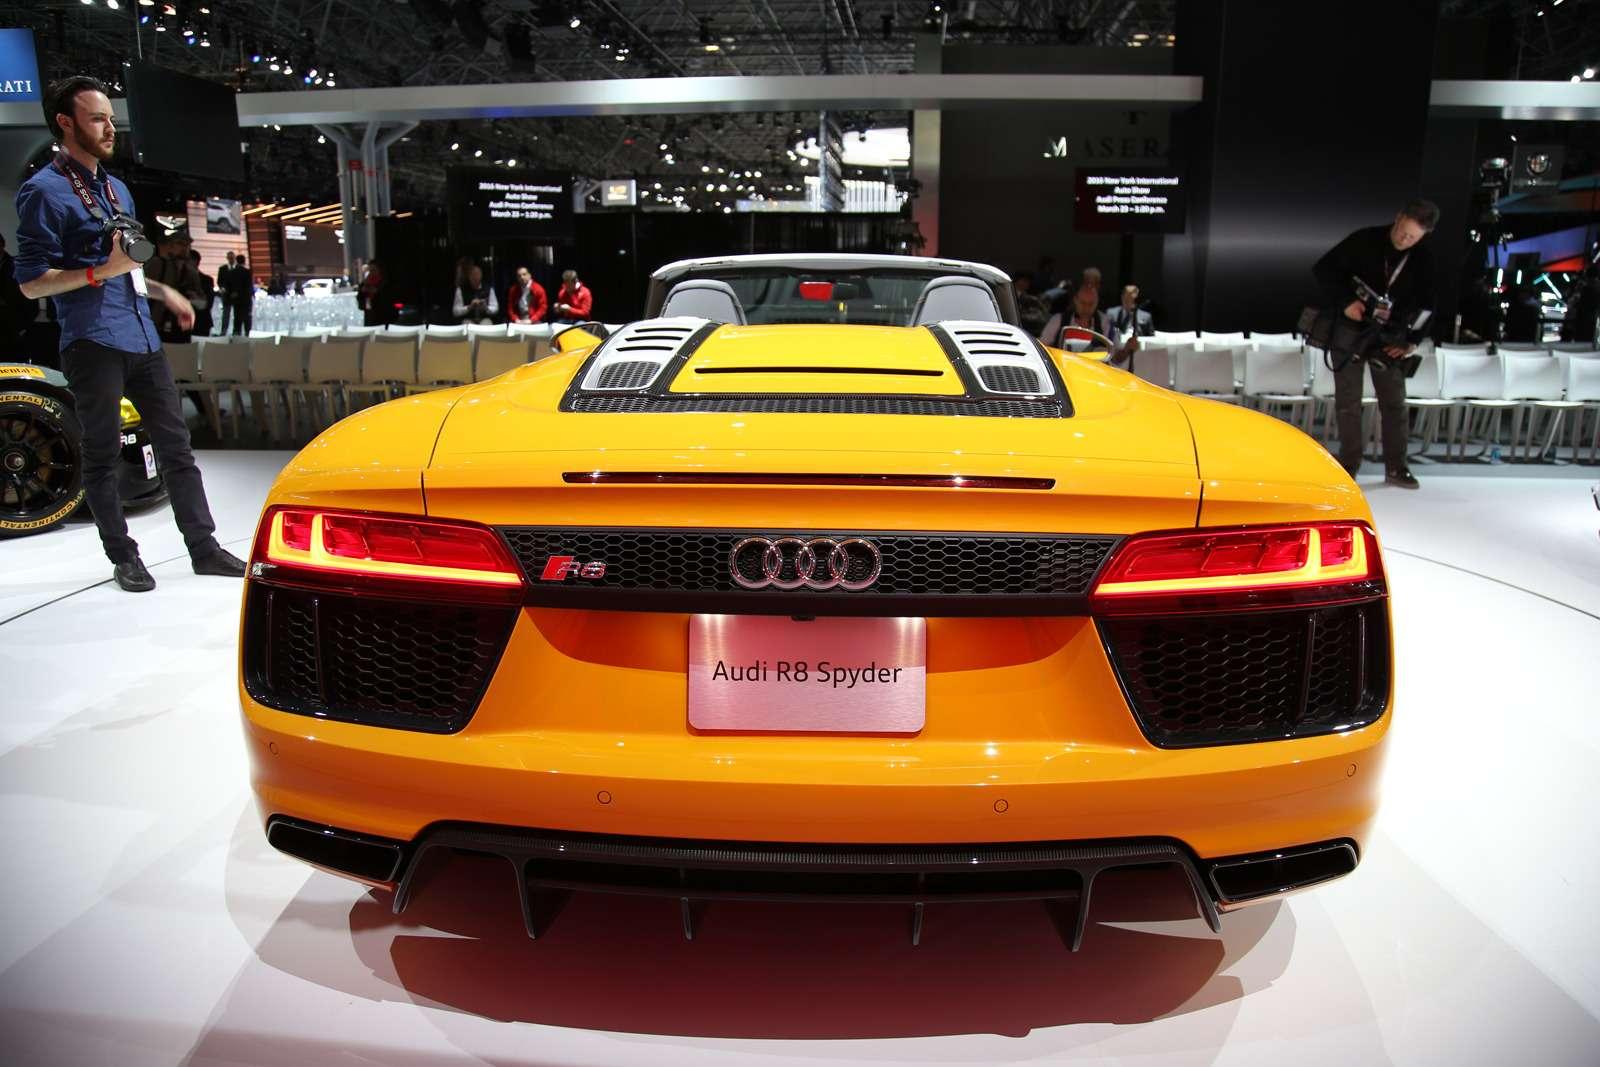 Audi R8Spyder